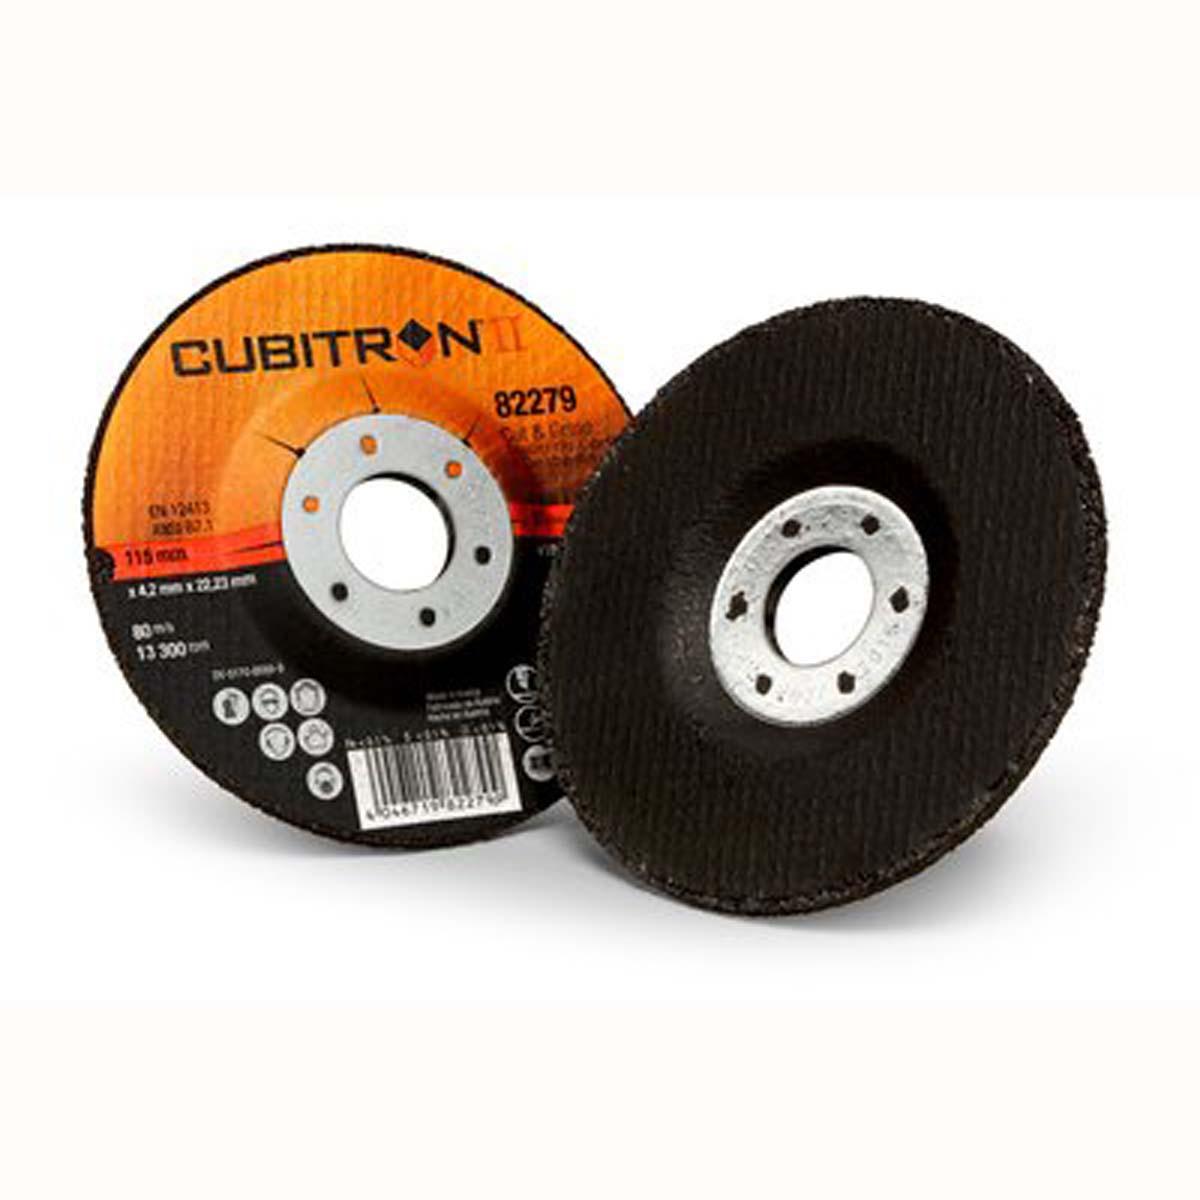 3M Cubitron II Cut and Grind Wheel T27  82279  4 1/2 in x 1/8 in x 7/8 in